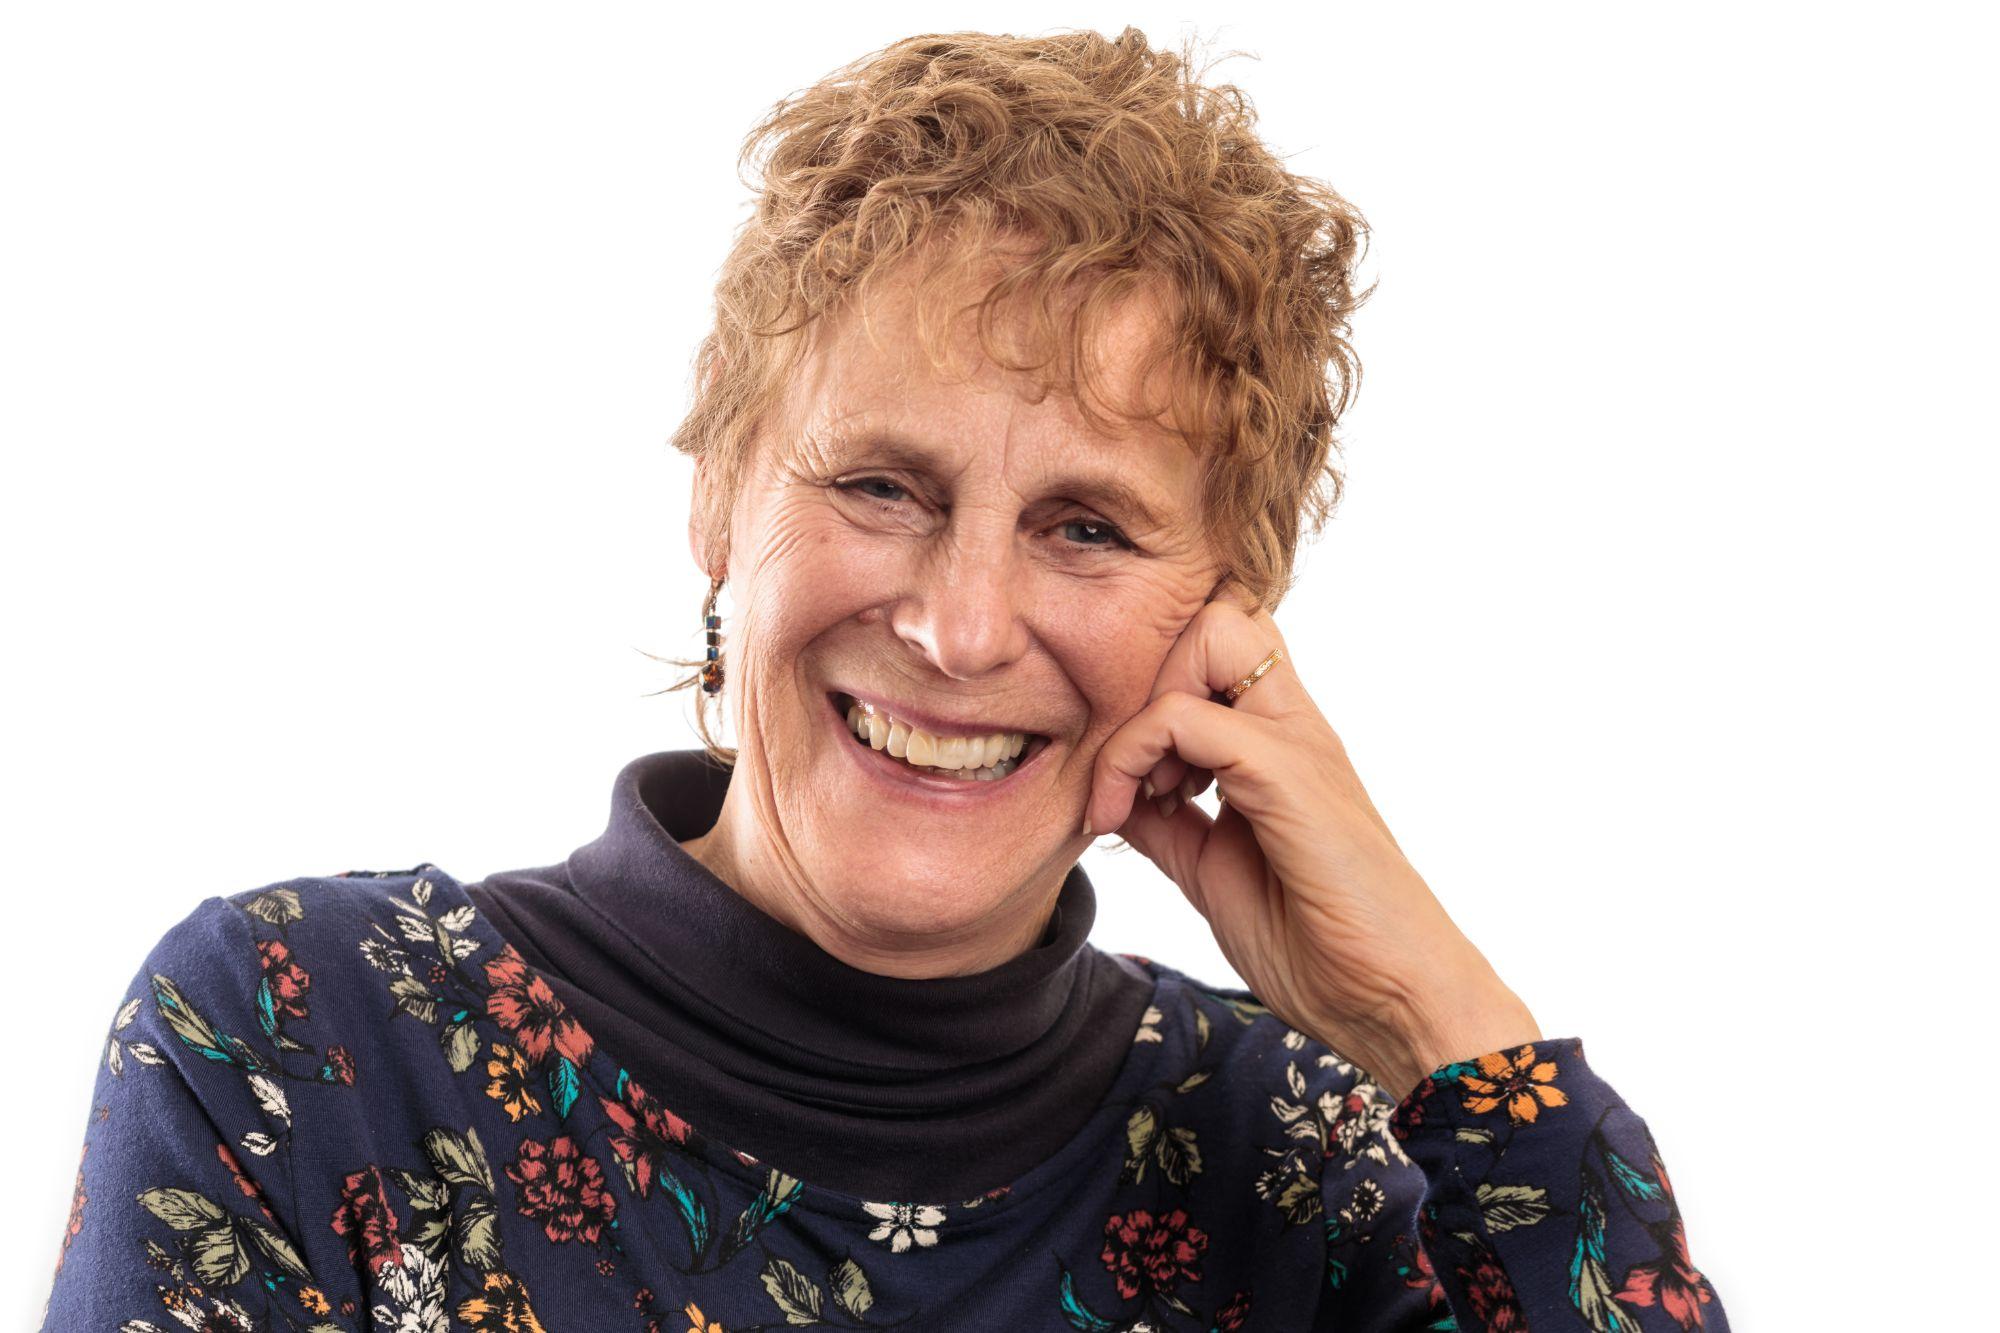 Delcia McNeil - Psychotherapist Supervisor, Mentor, Healer, Artist